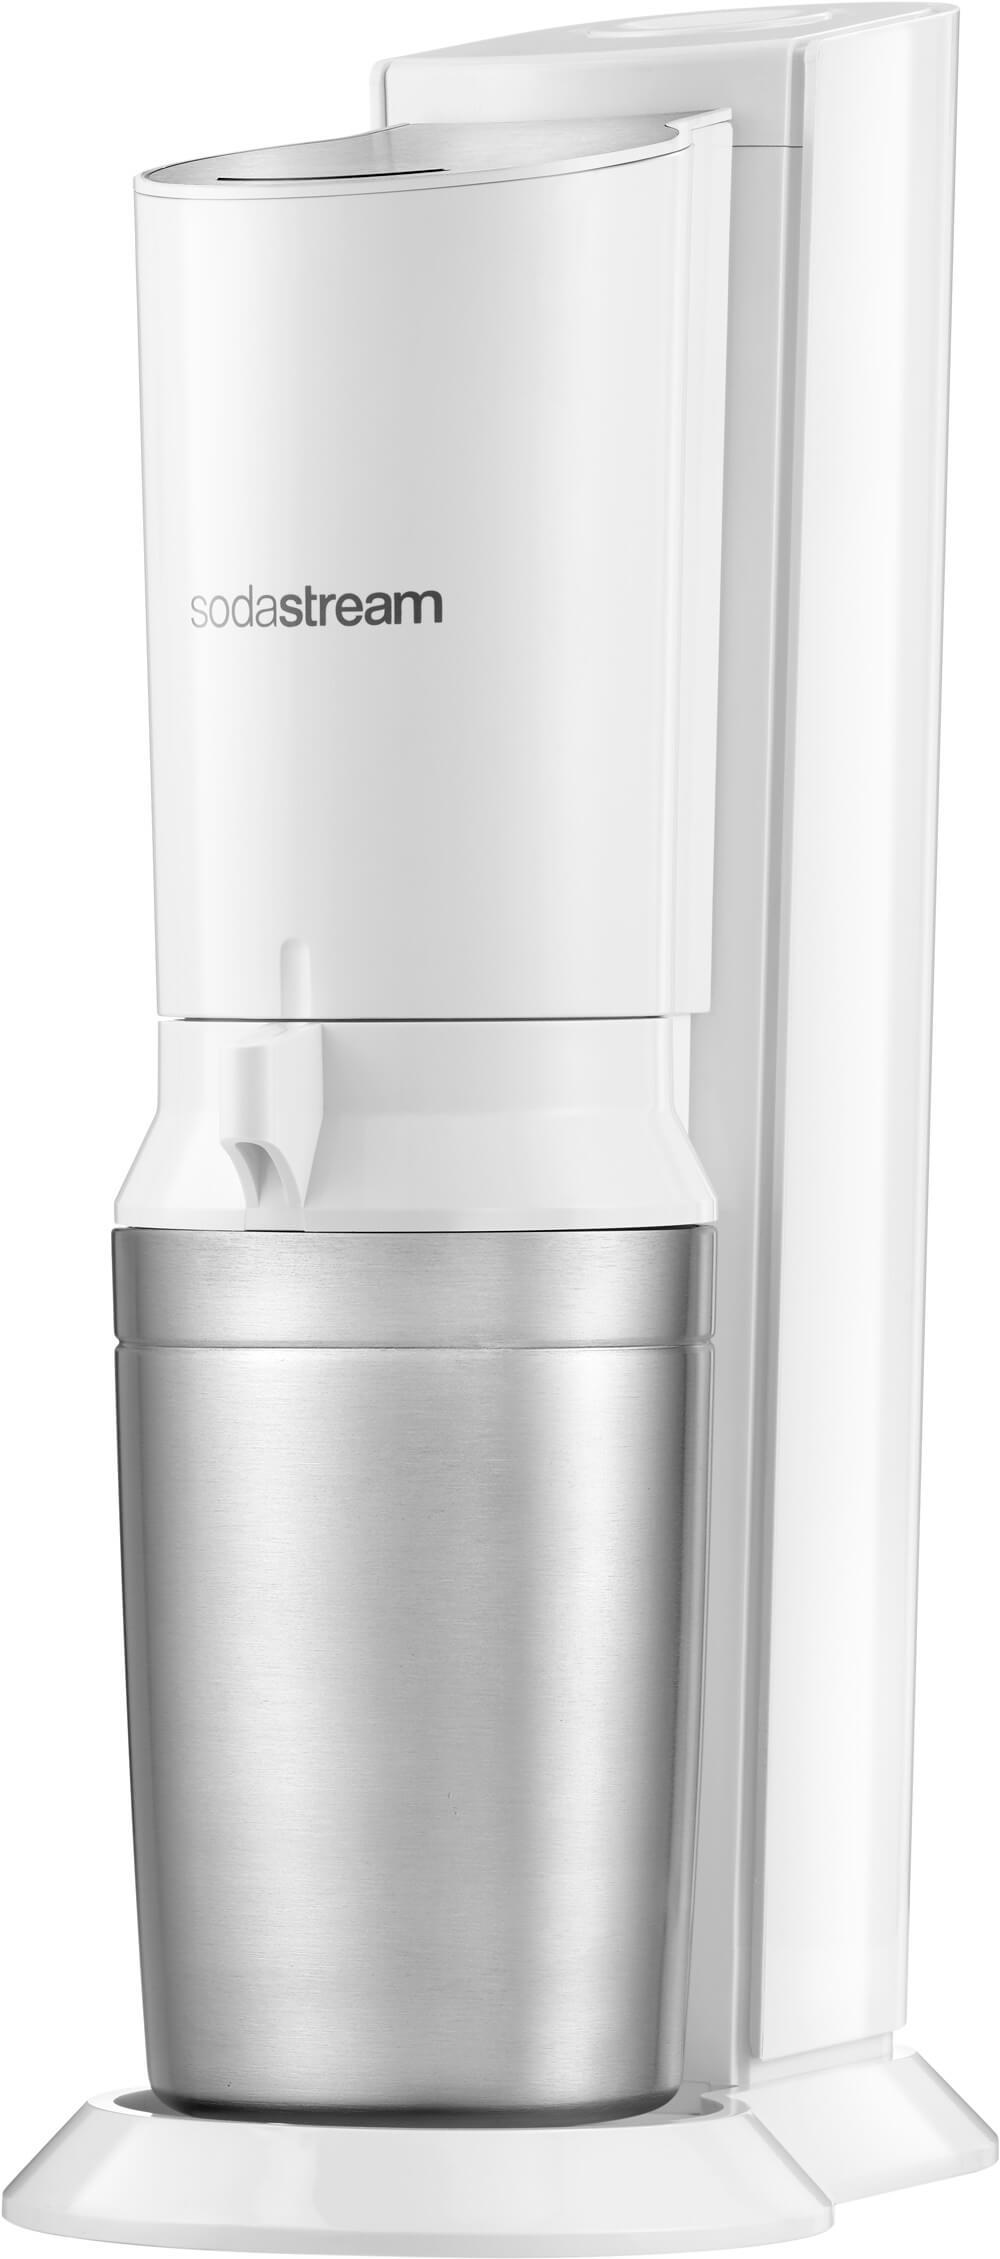 SodaStream Crystal Kolsyremaskin Vit/Metall